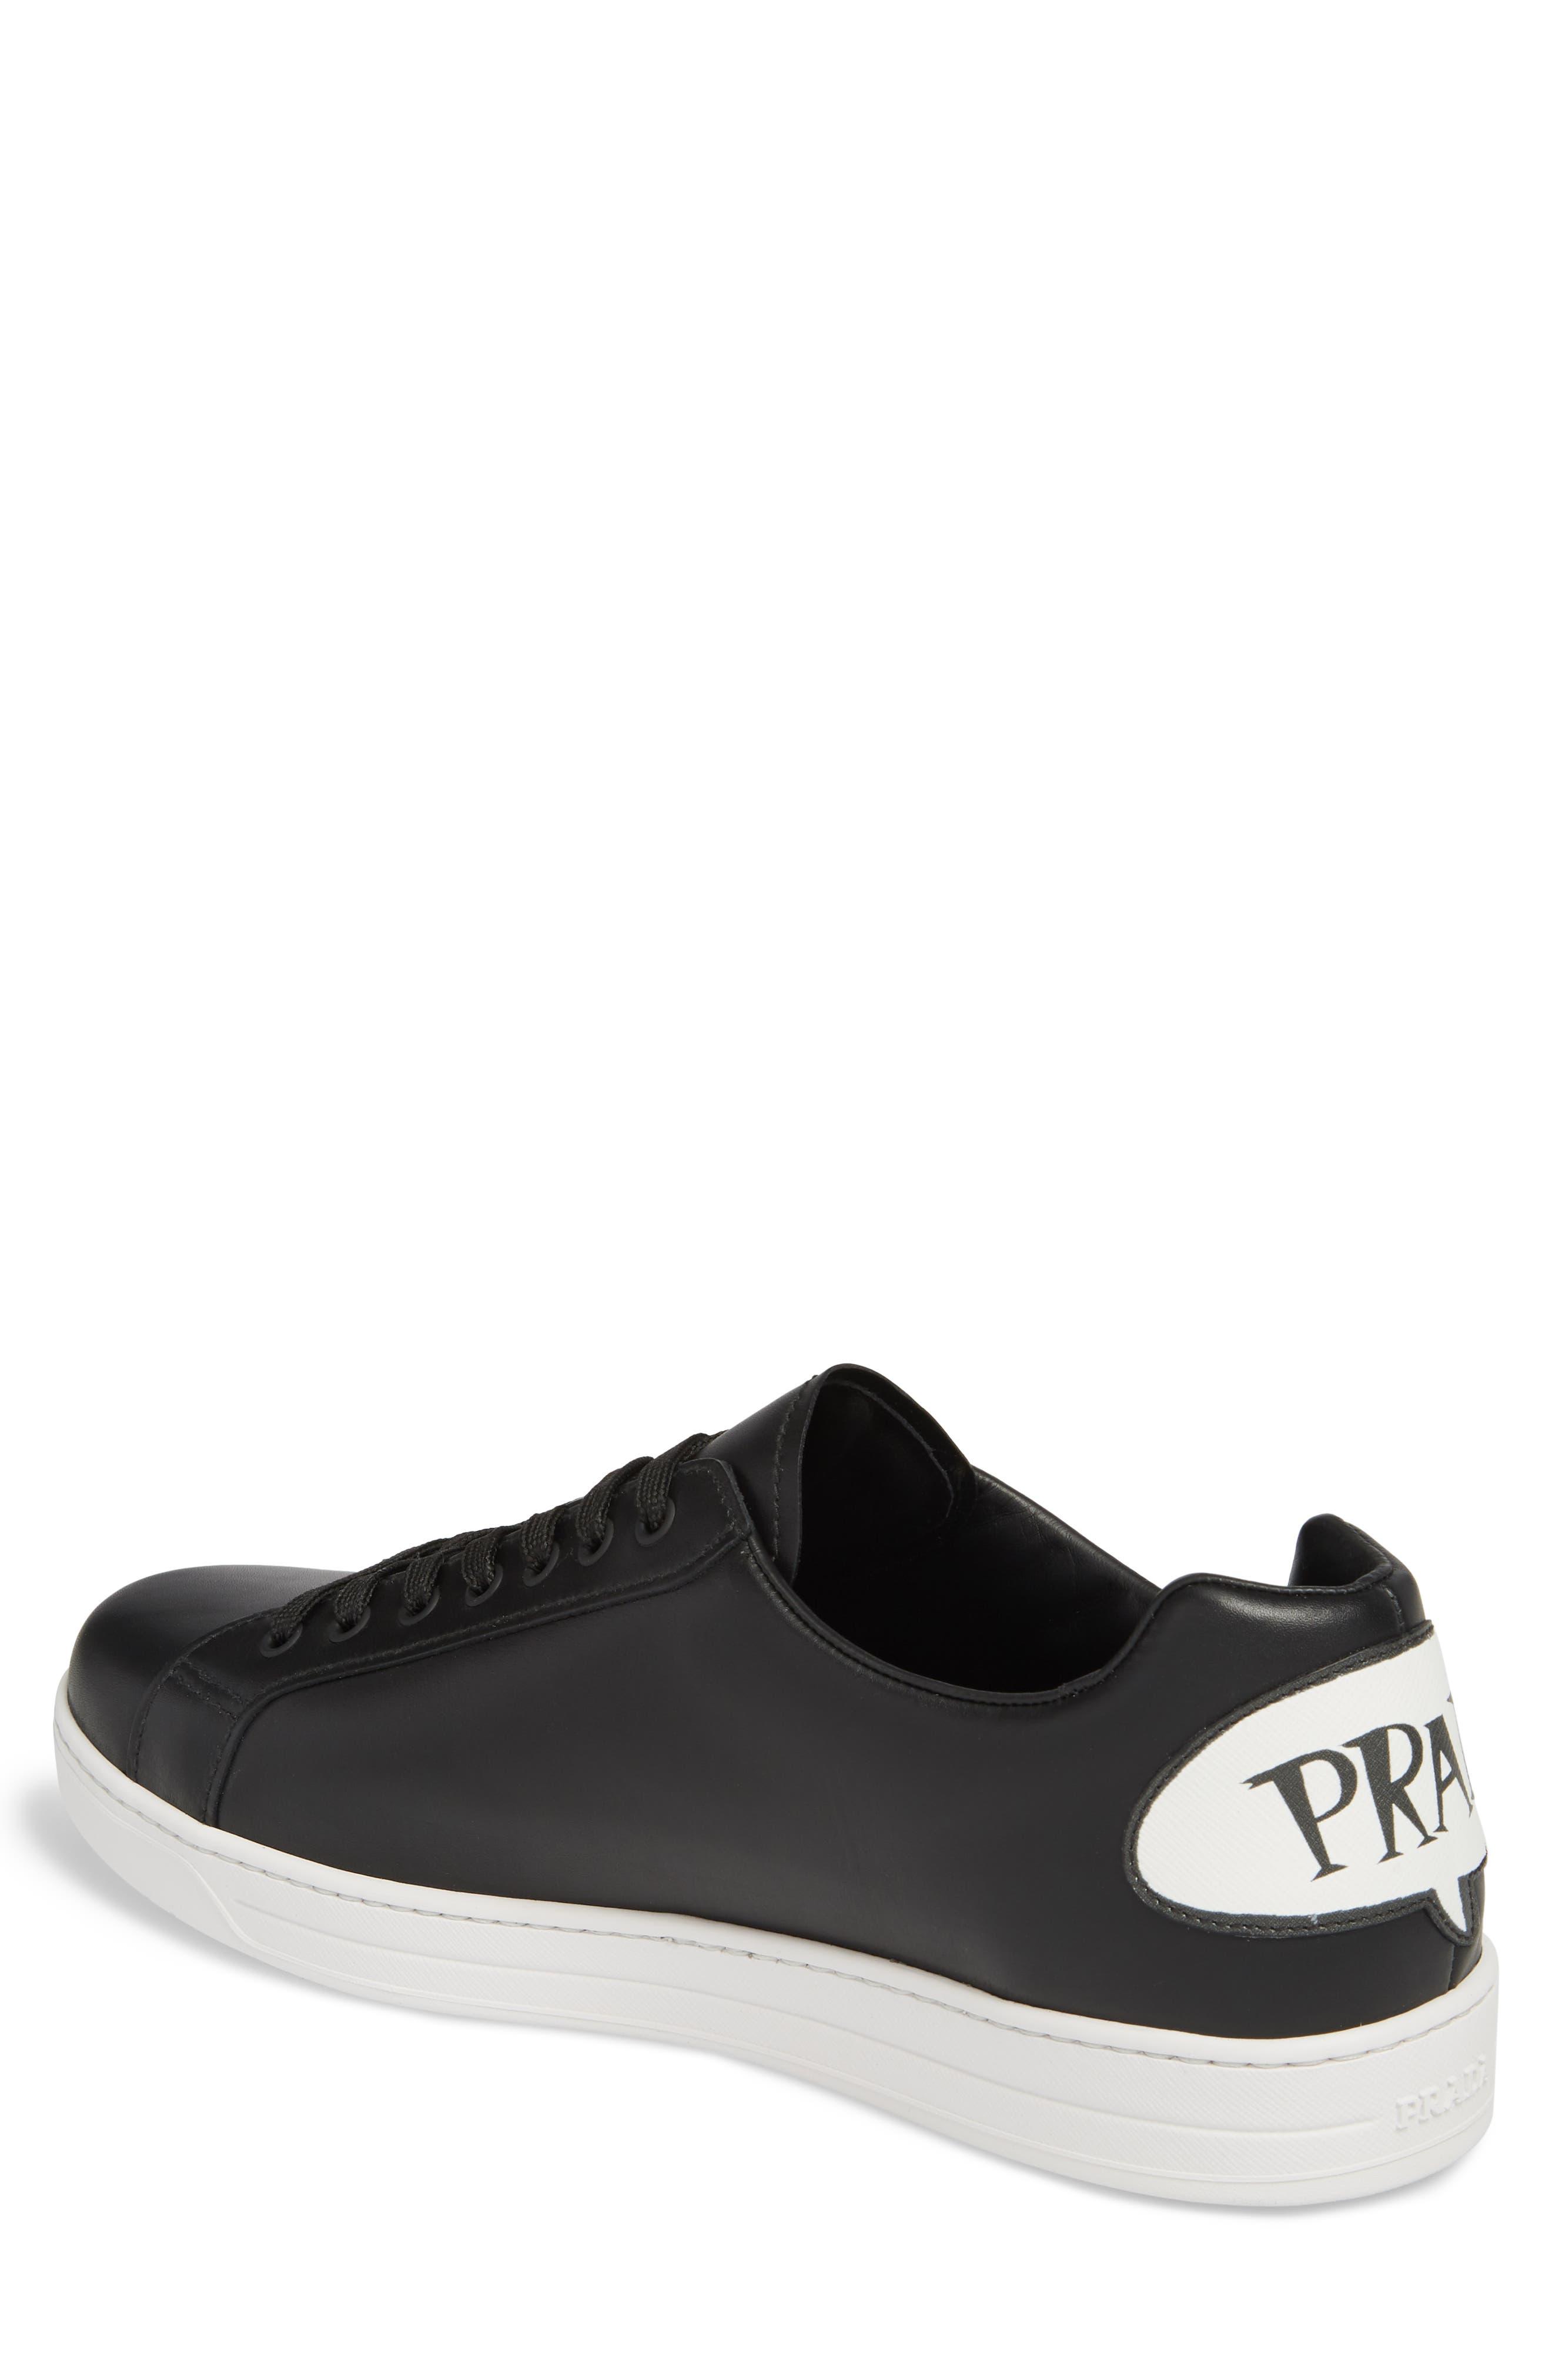 PRADA LINEA ROSSA,                             Patch Low Top Sneaker,                             Alternate thumbnail 2, color,                             012